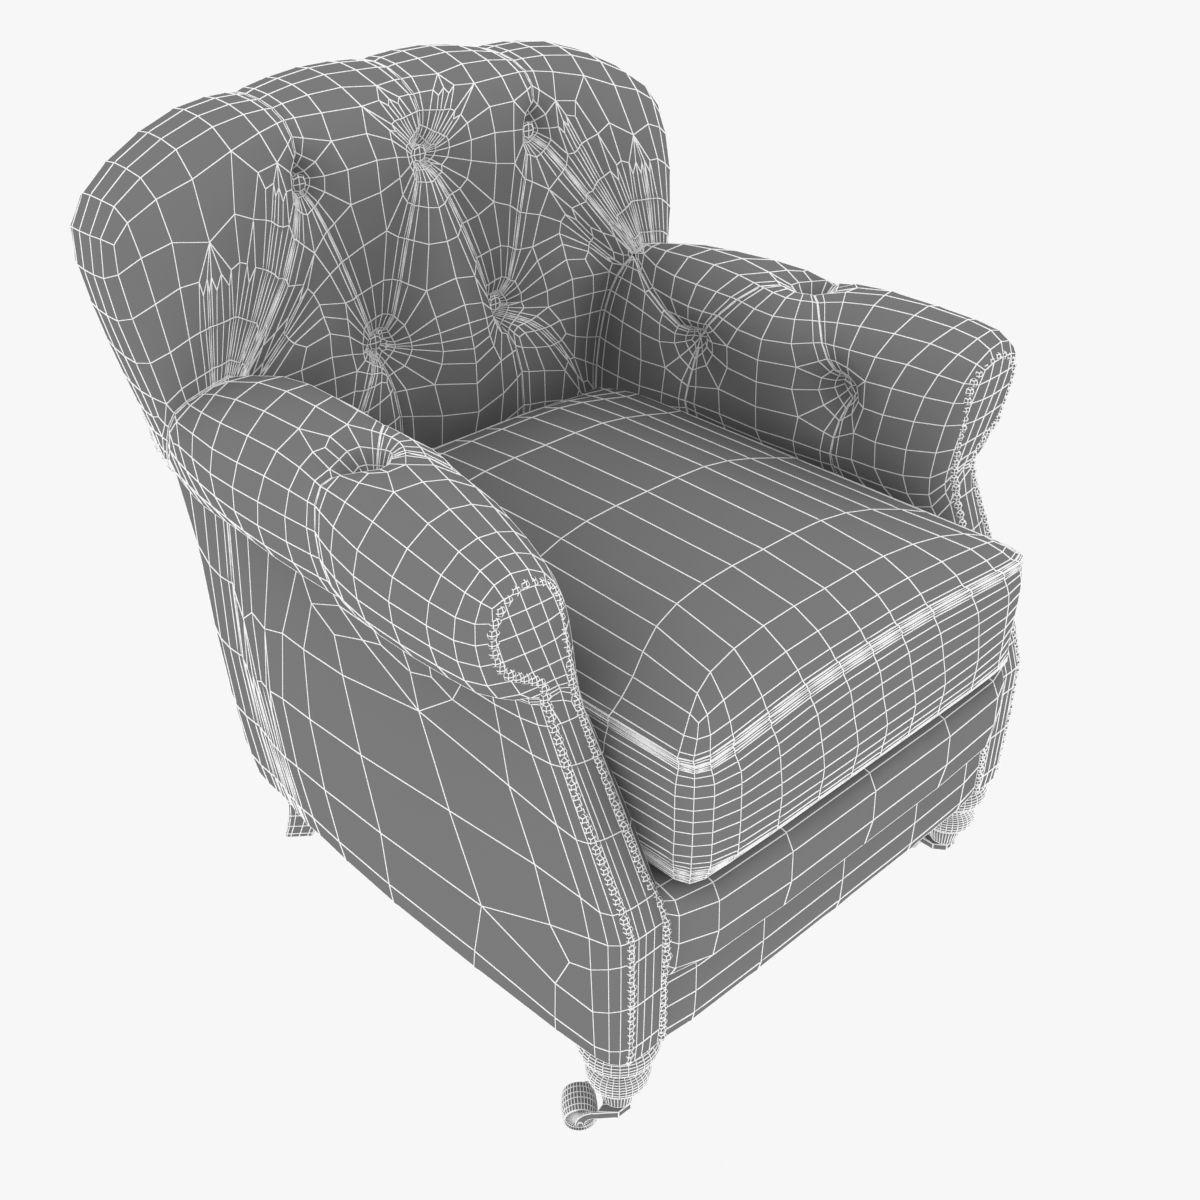 noir furniture chairs chair yoga video club vintage cigar le 3d model